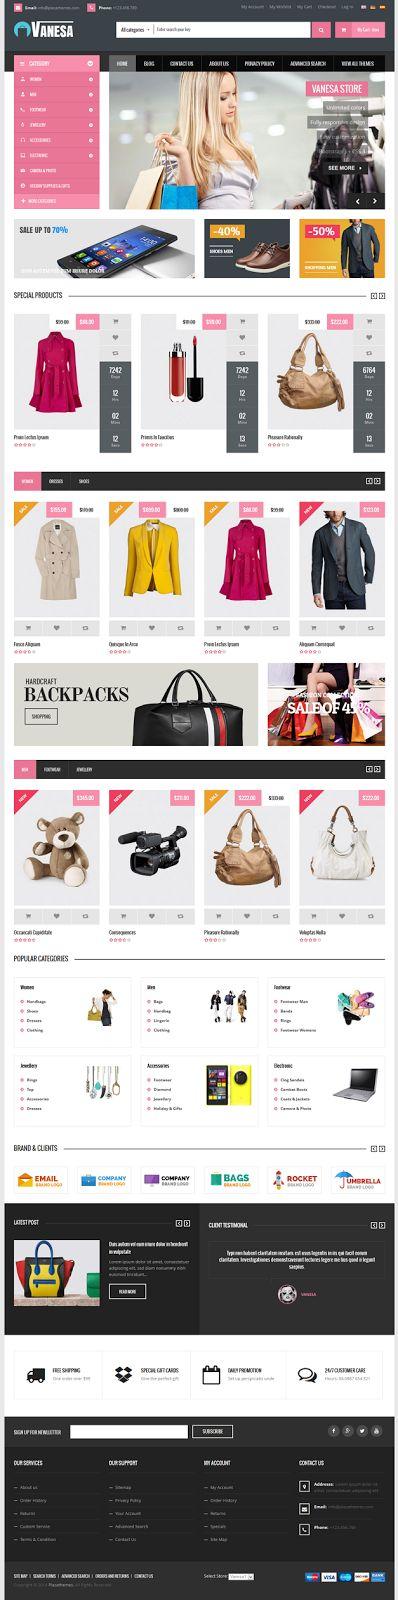 Best 25+ Ecommerce website design ideas on Pinterest